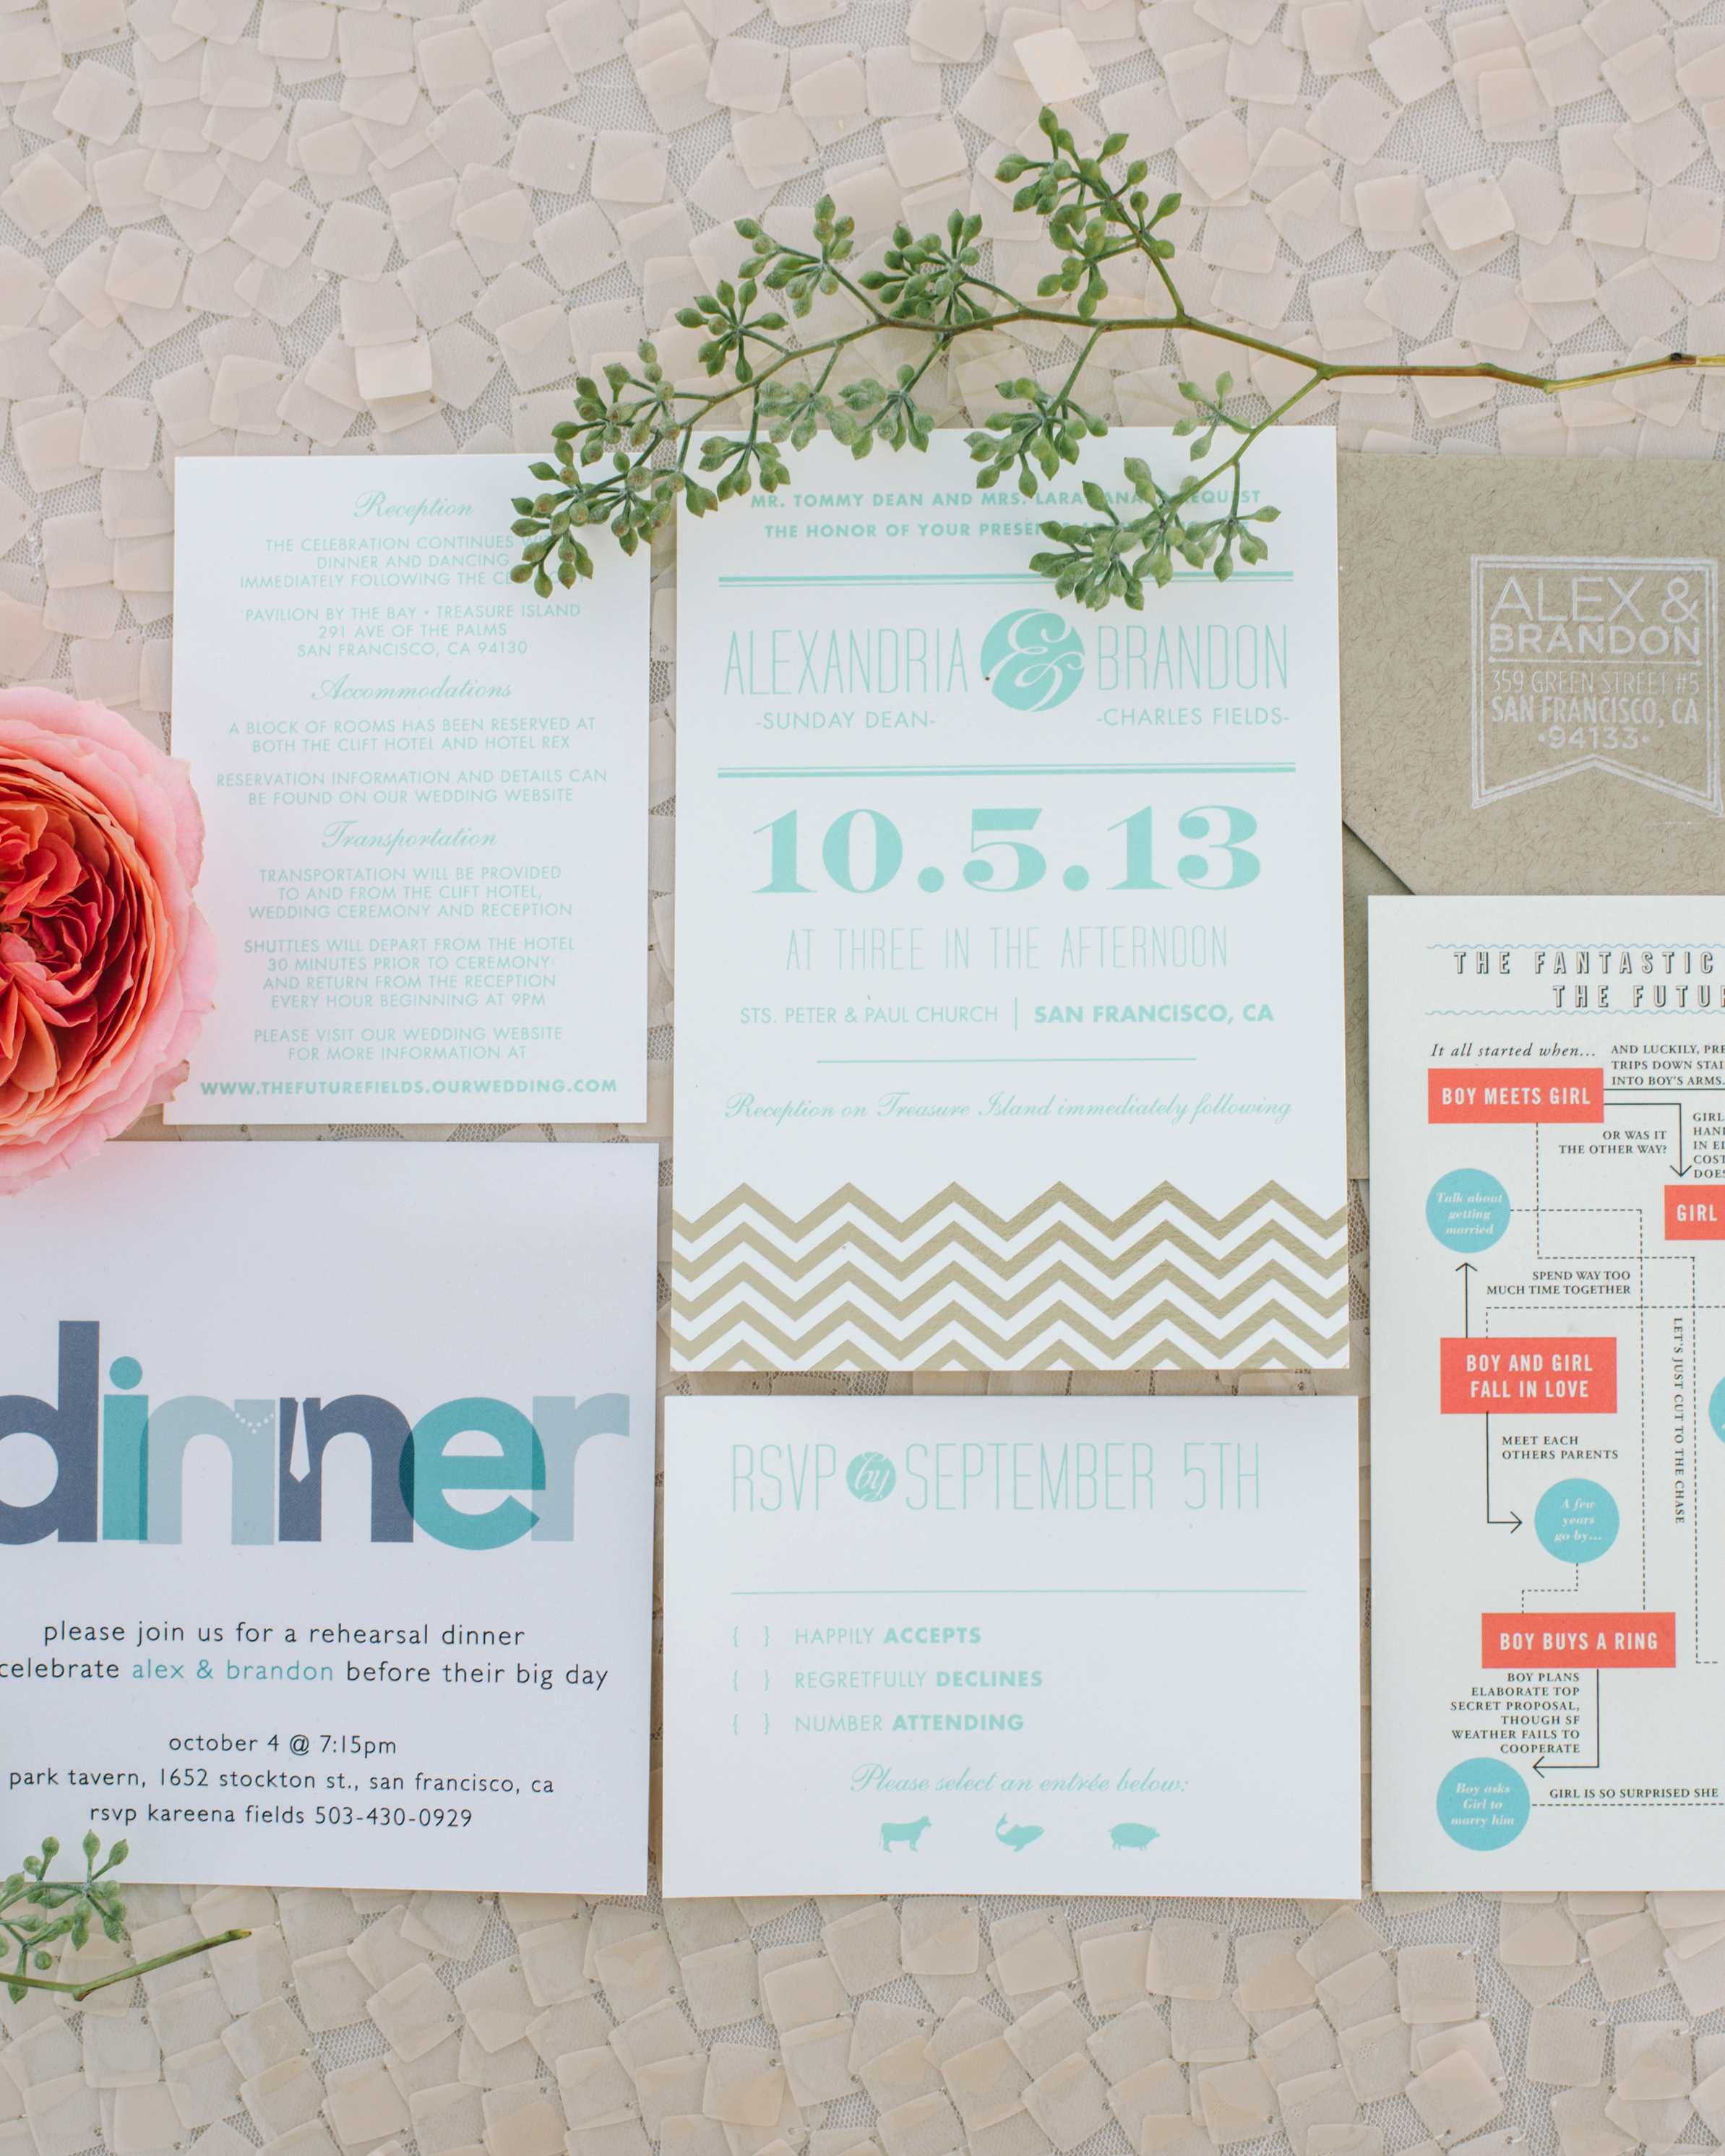 alex-brandon-wedding-invite-096-s111338-0714.jpg